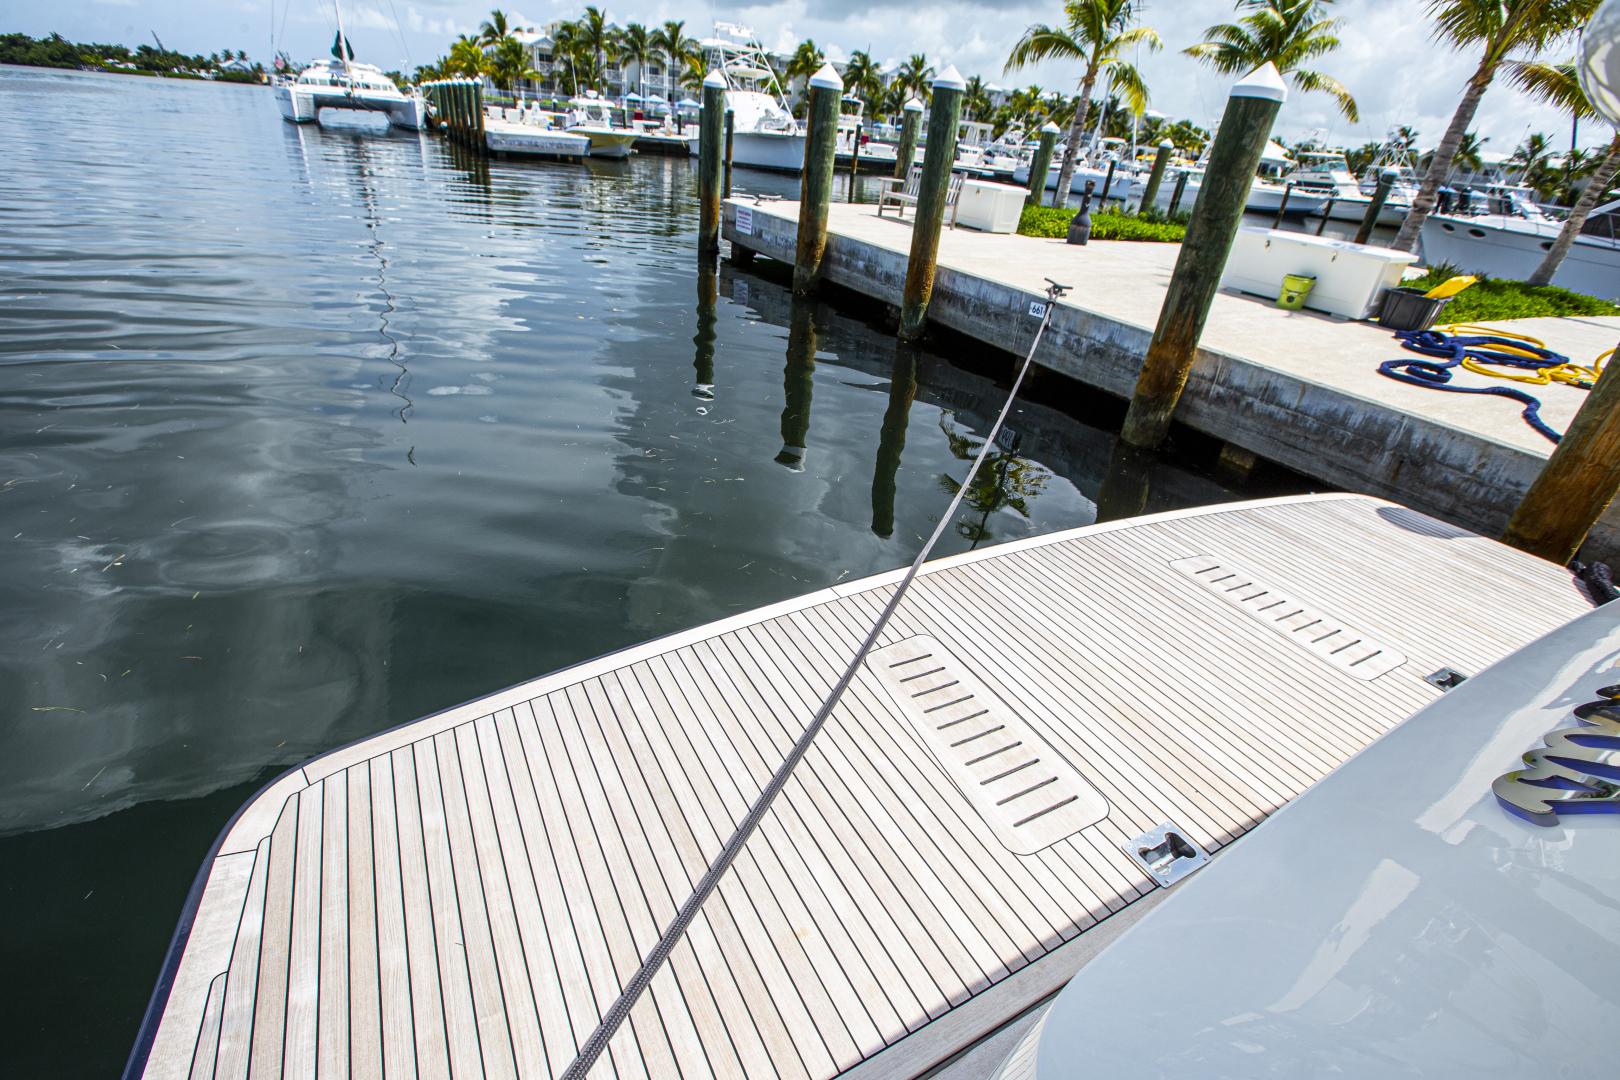 Viking Princess-V85 2009-Las Brisas Fort Lauderdale-Florida-United States-1365549 | Thumbnail